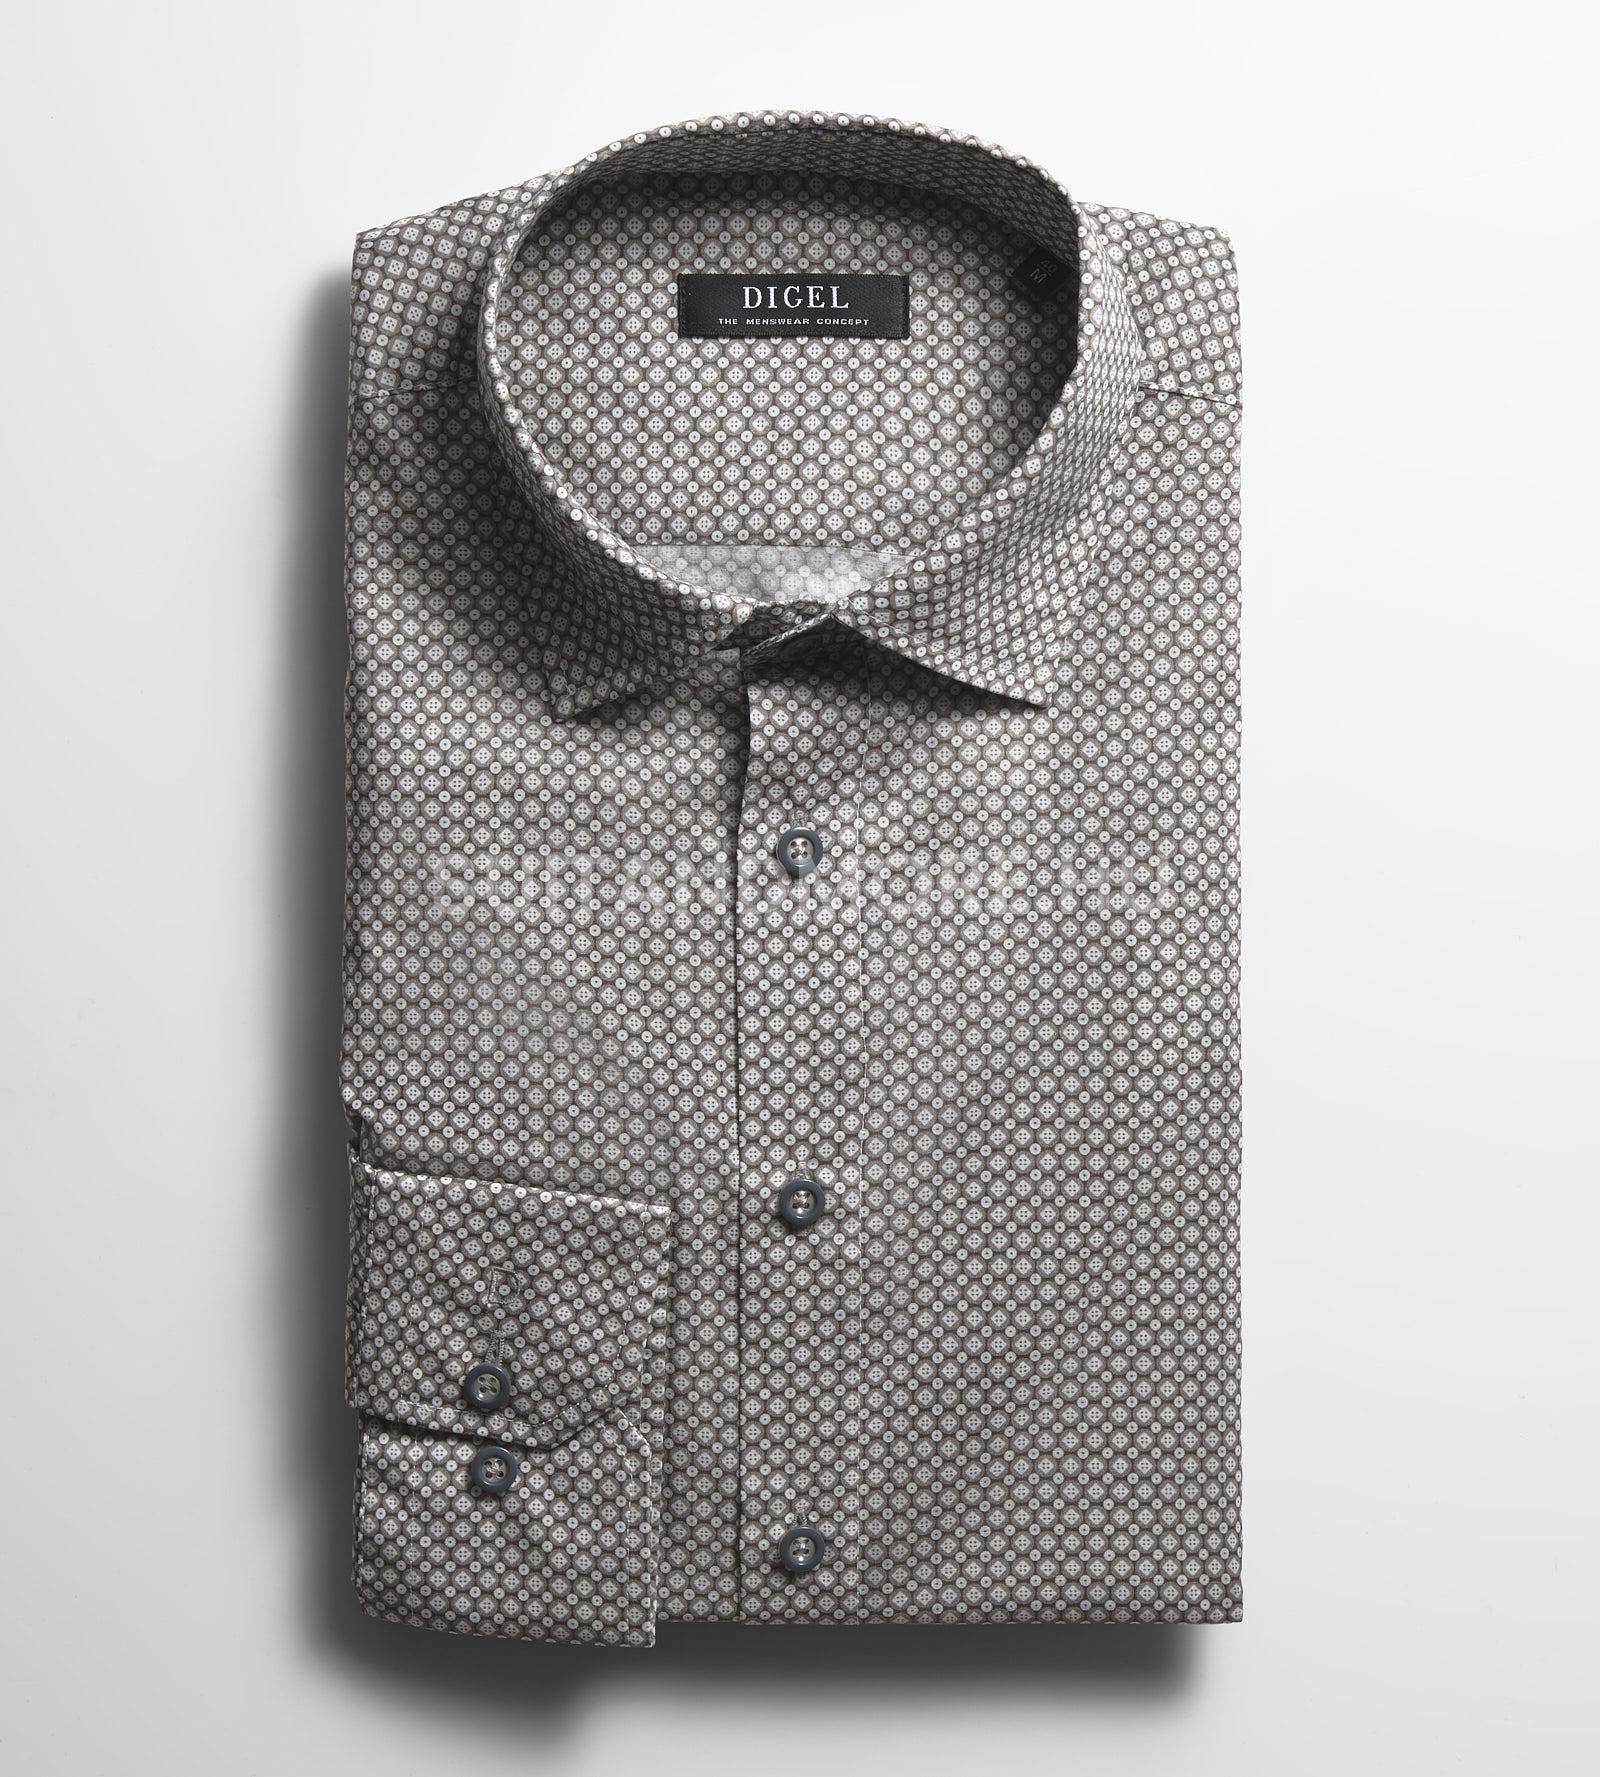 digel-szurke-modern-fit-nyomott-mintas-ing-dabato1-1-1167033-48